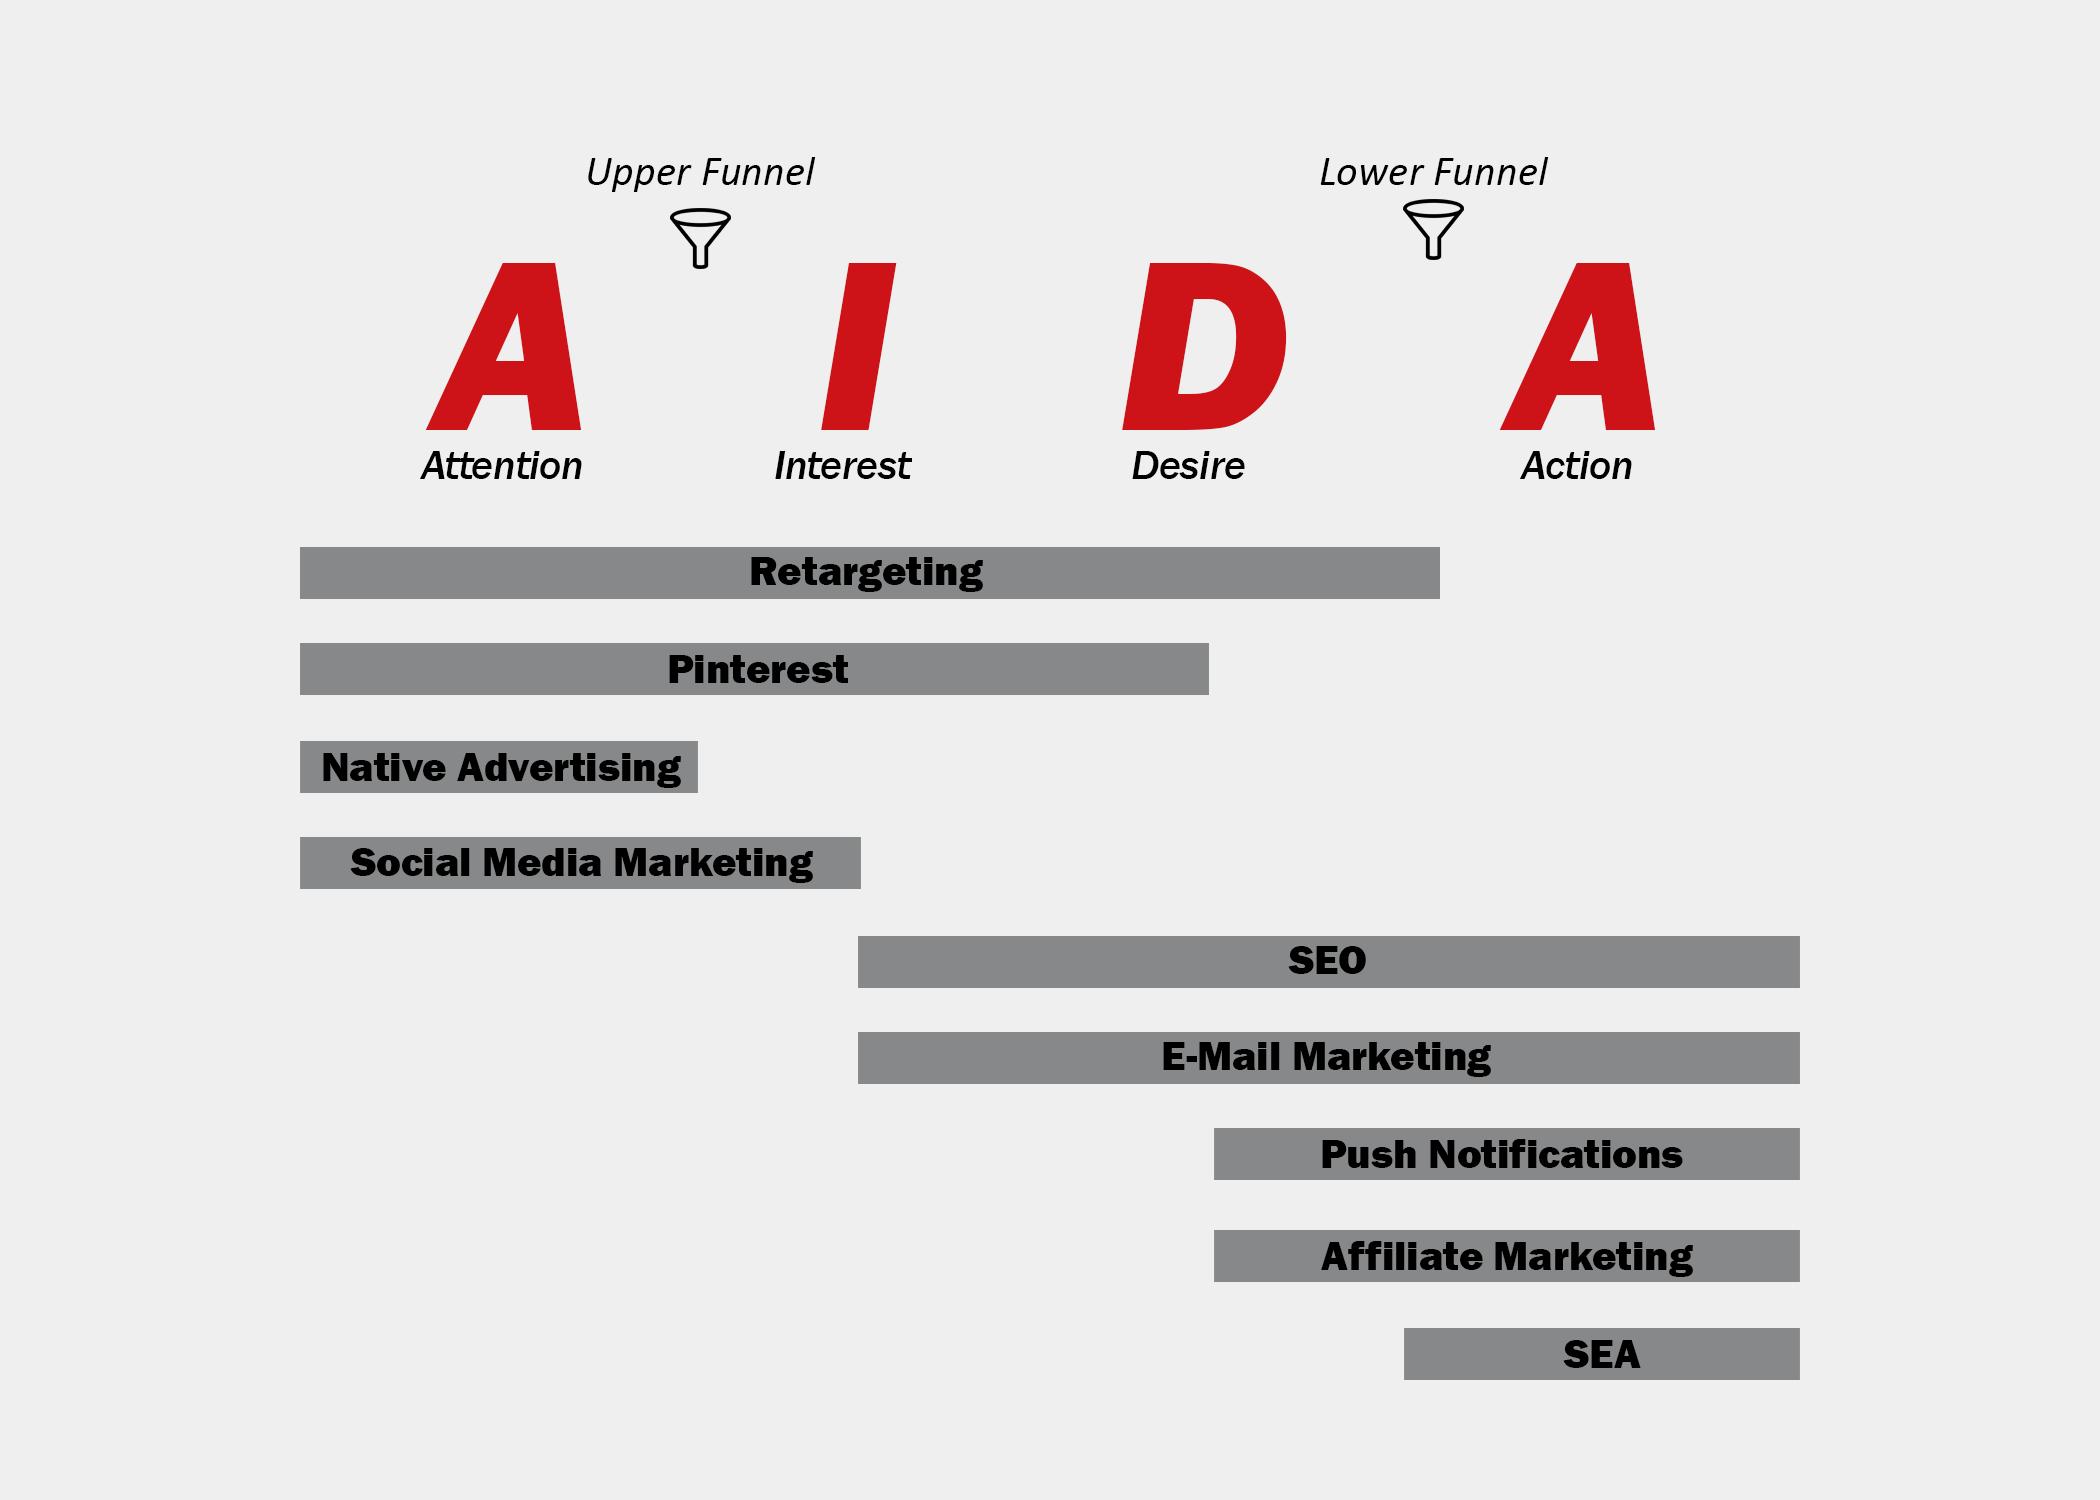 Das AIDA Modell: Performance Marketing Maßnahmen im Upper und Lower Funnel